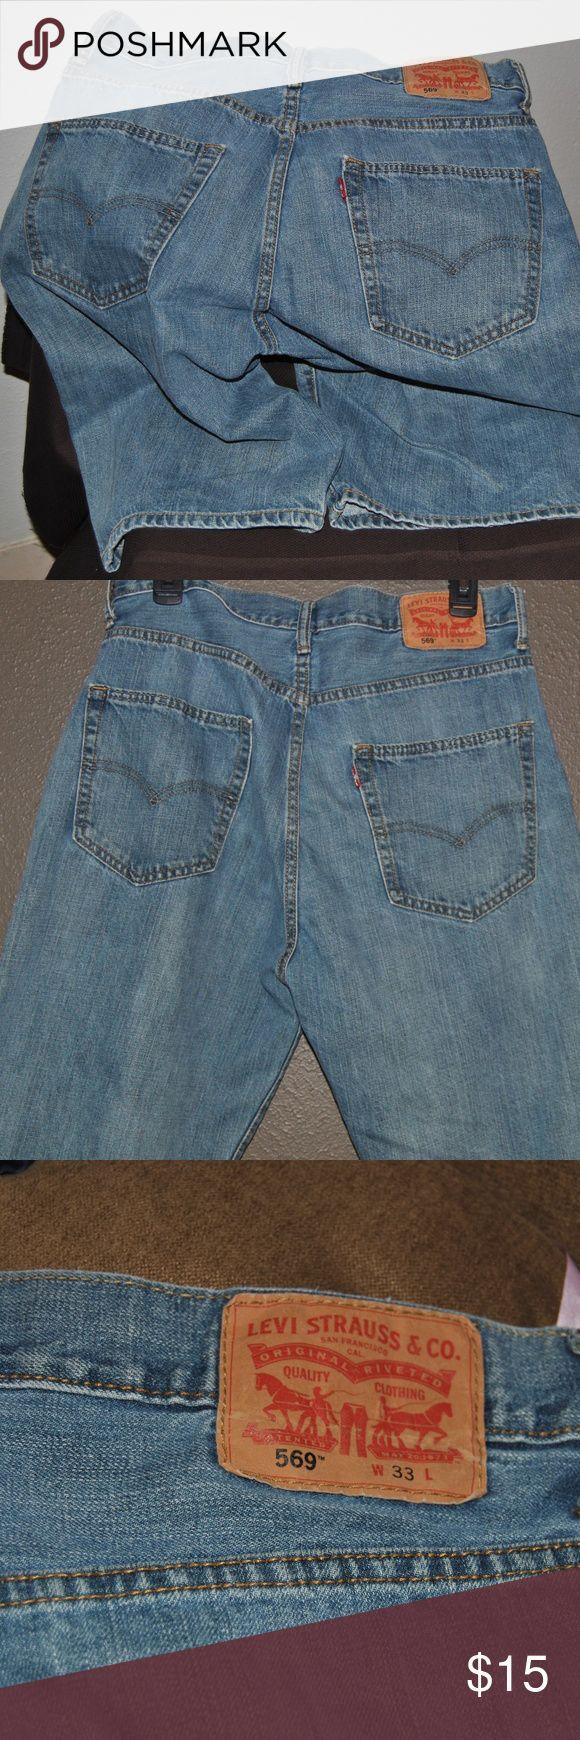 Men's Levi 569 denim shorts Levi 569 Men's denim shorts; regular length; size 33 waist. Levi's Shorts Jean Shorts